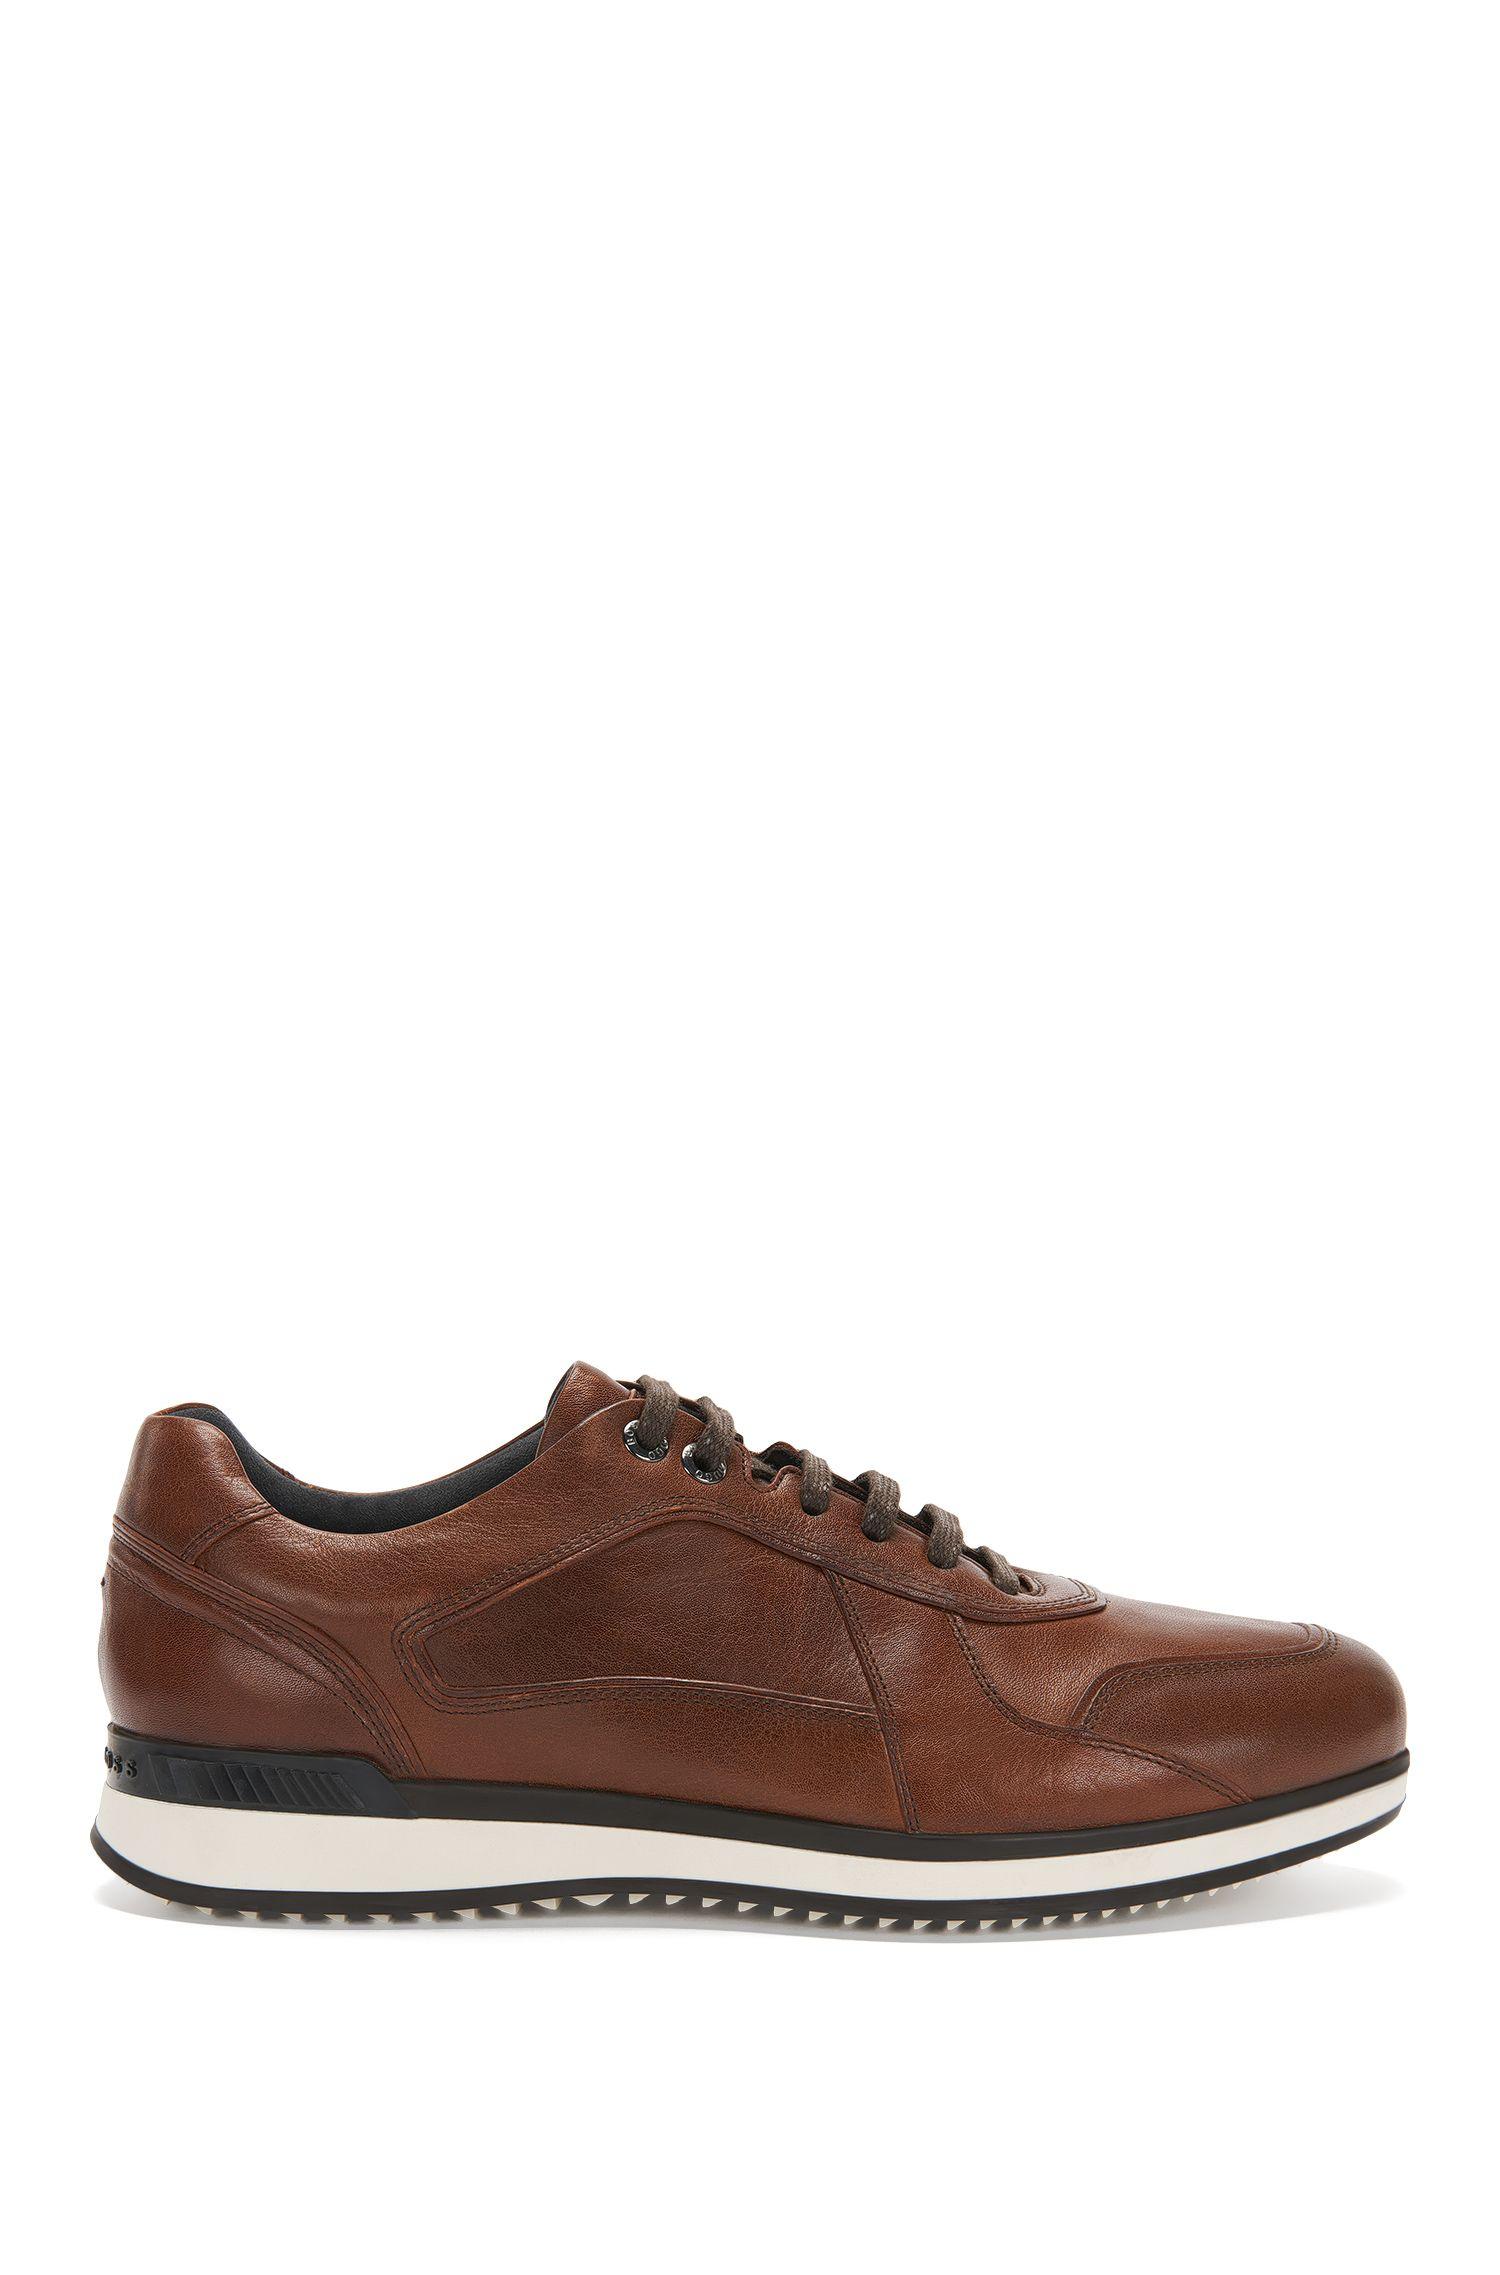 Sneakers aus Leder mit Schichtsohle: 'Heritage_Lowp_lt'